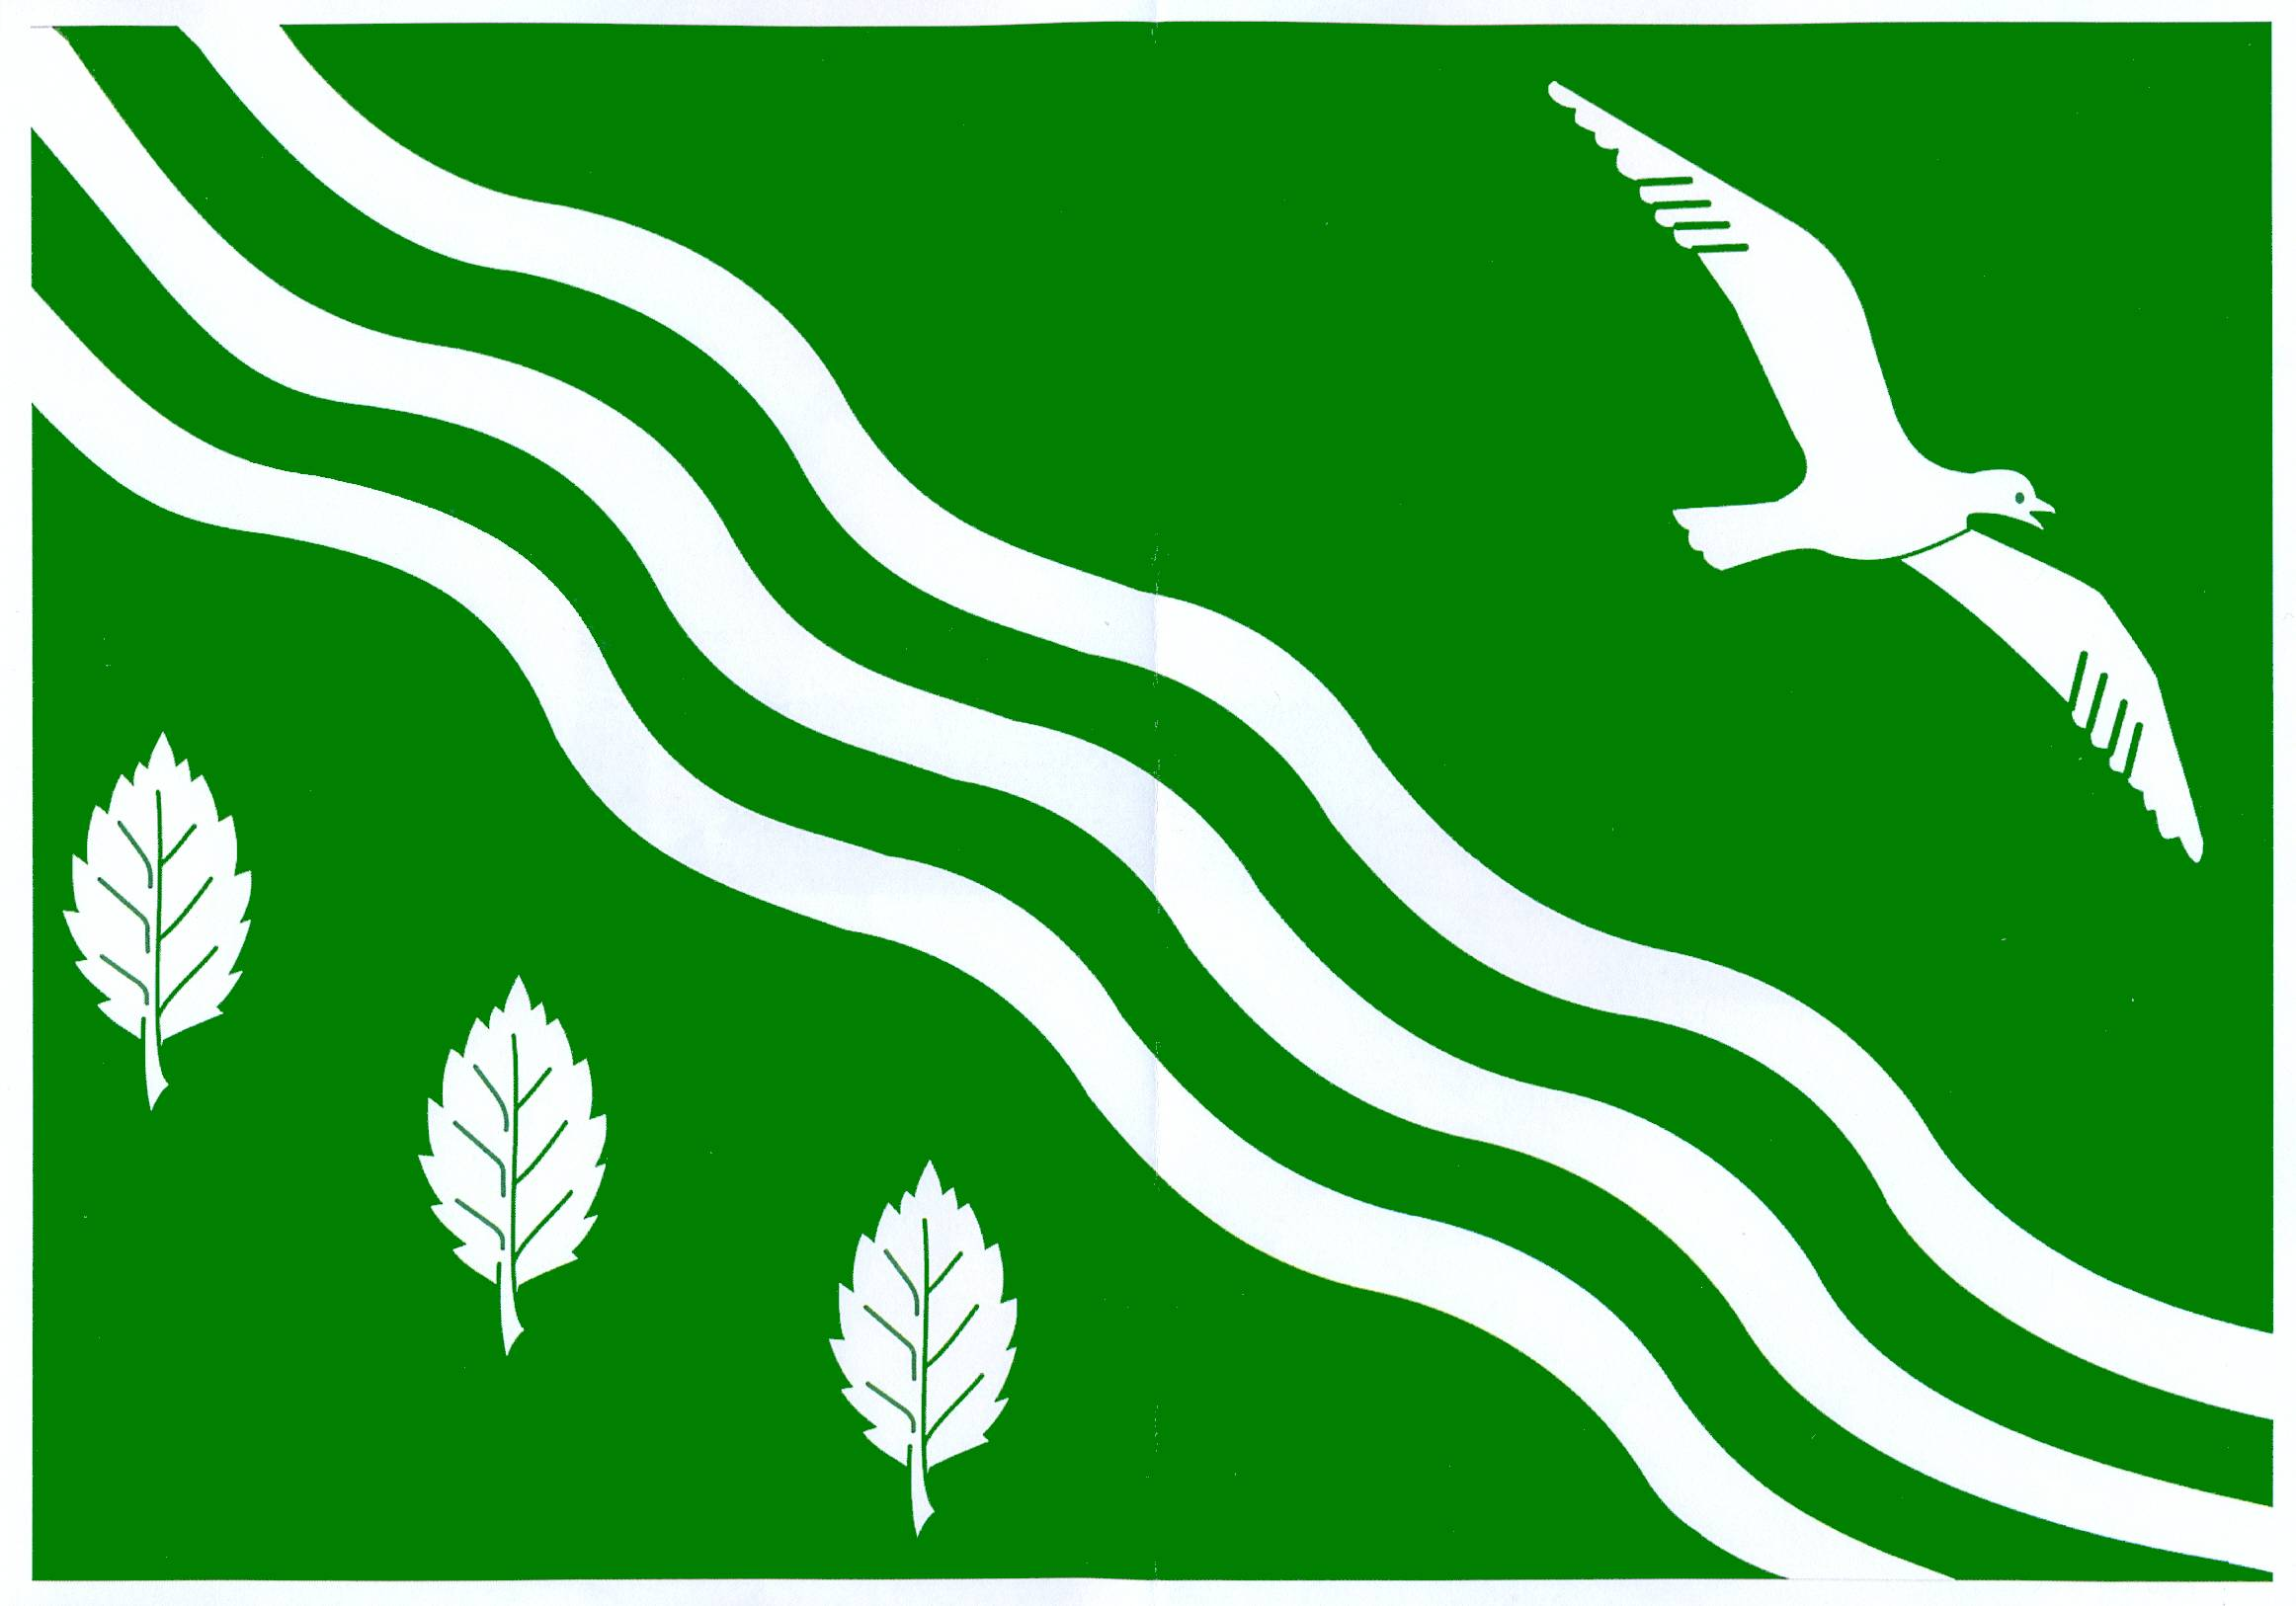 Flagge GemeindeMolfsee, Kreis Rendsburg-Eckernförde